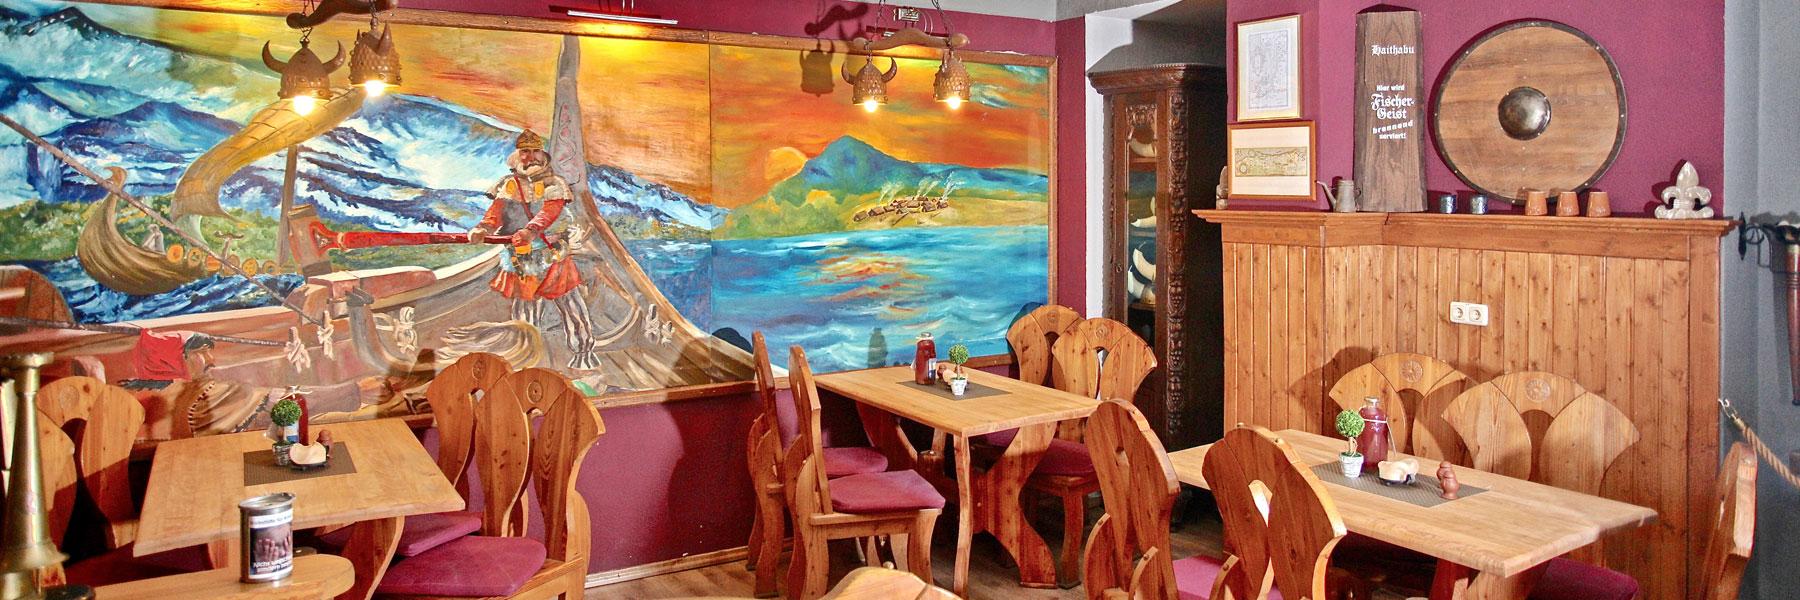 Gastraum - Gaststätte Haithabu